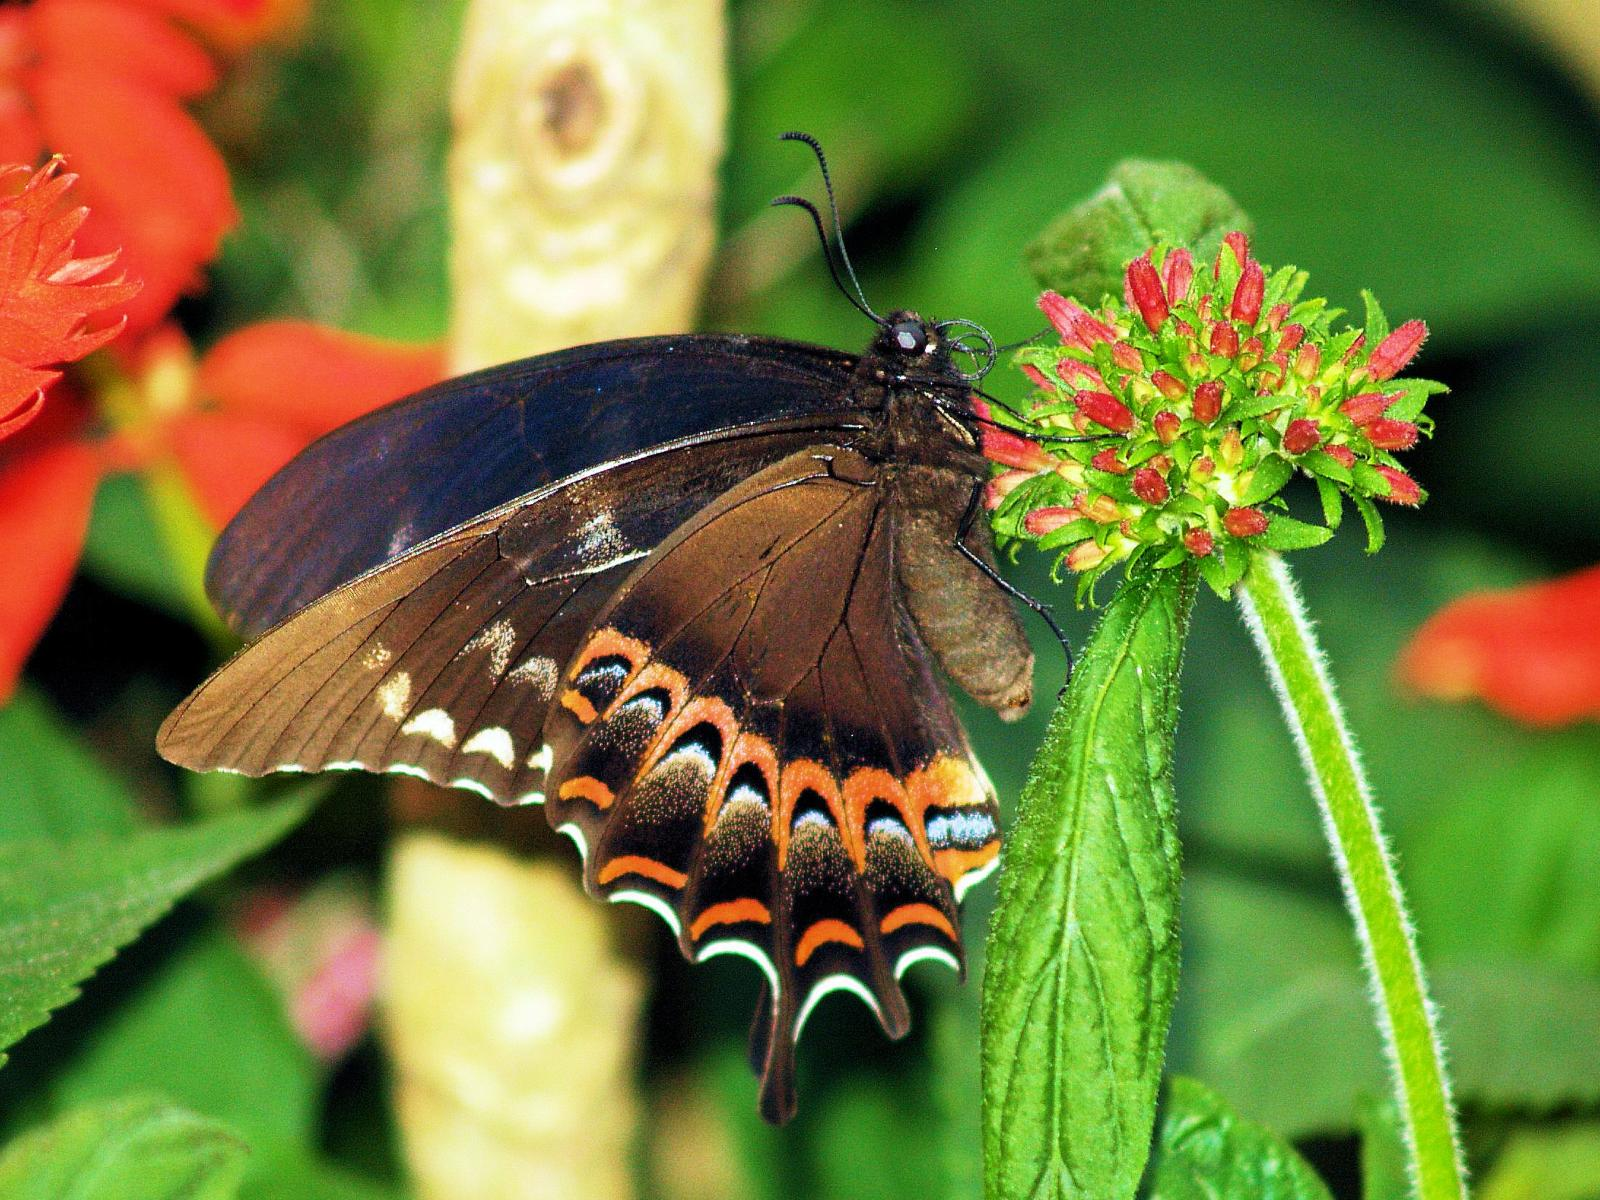 Butterfly Wallpapers Top Best Hd Wallpapers For Desktop